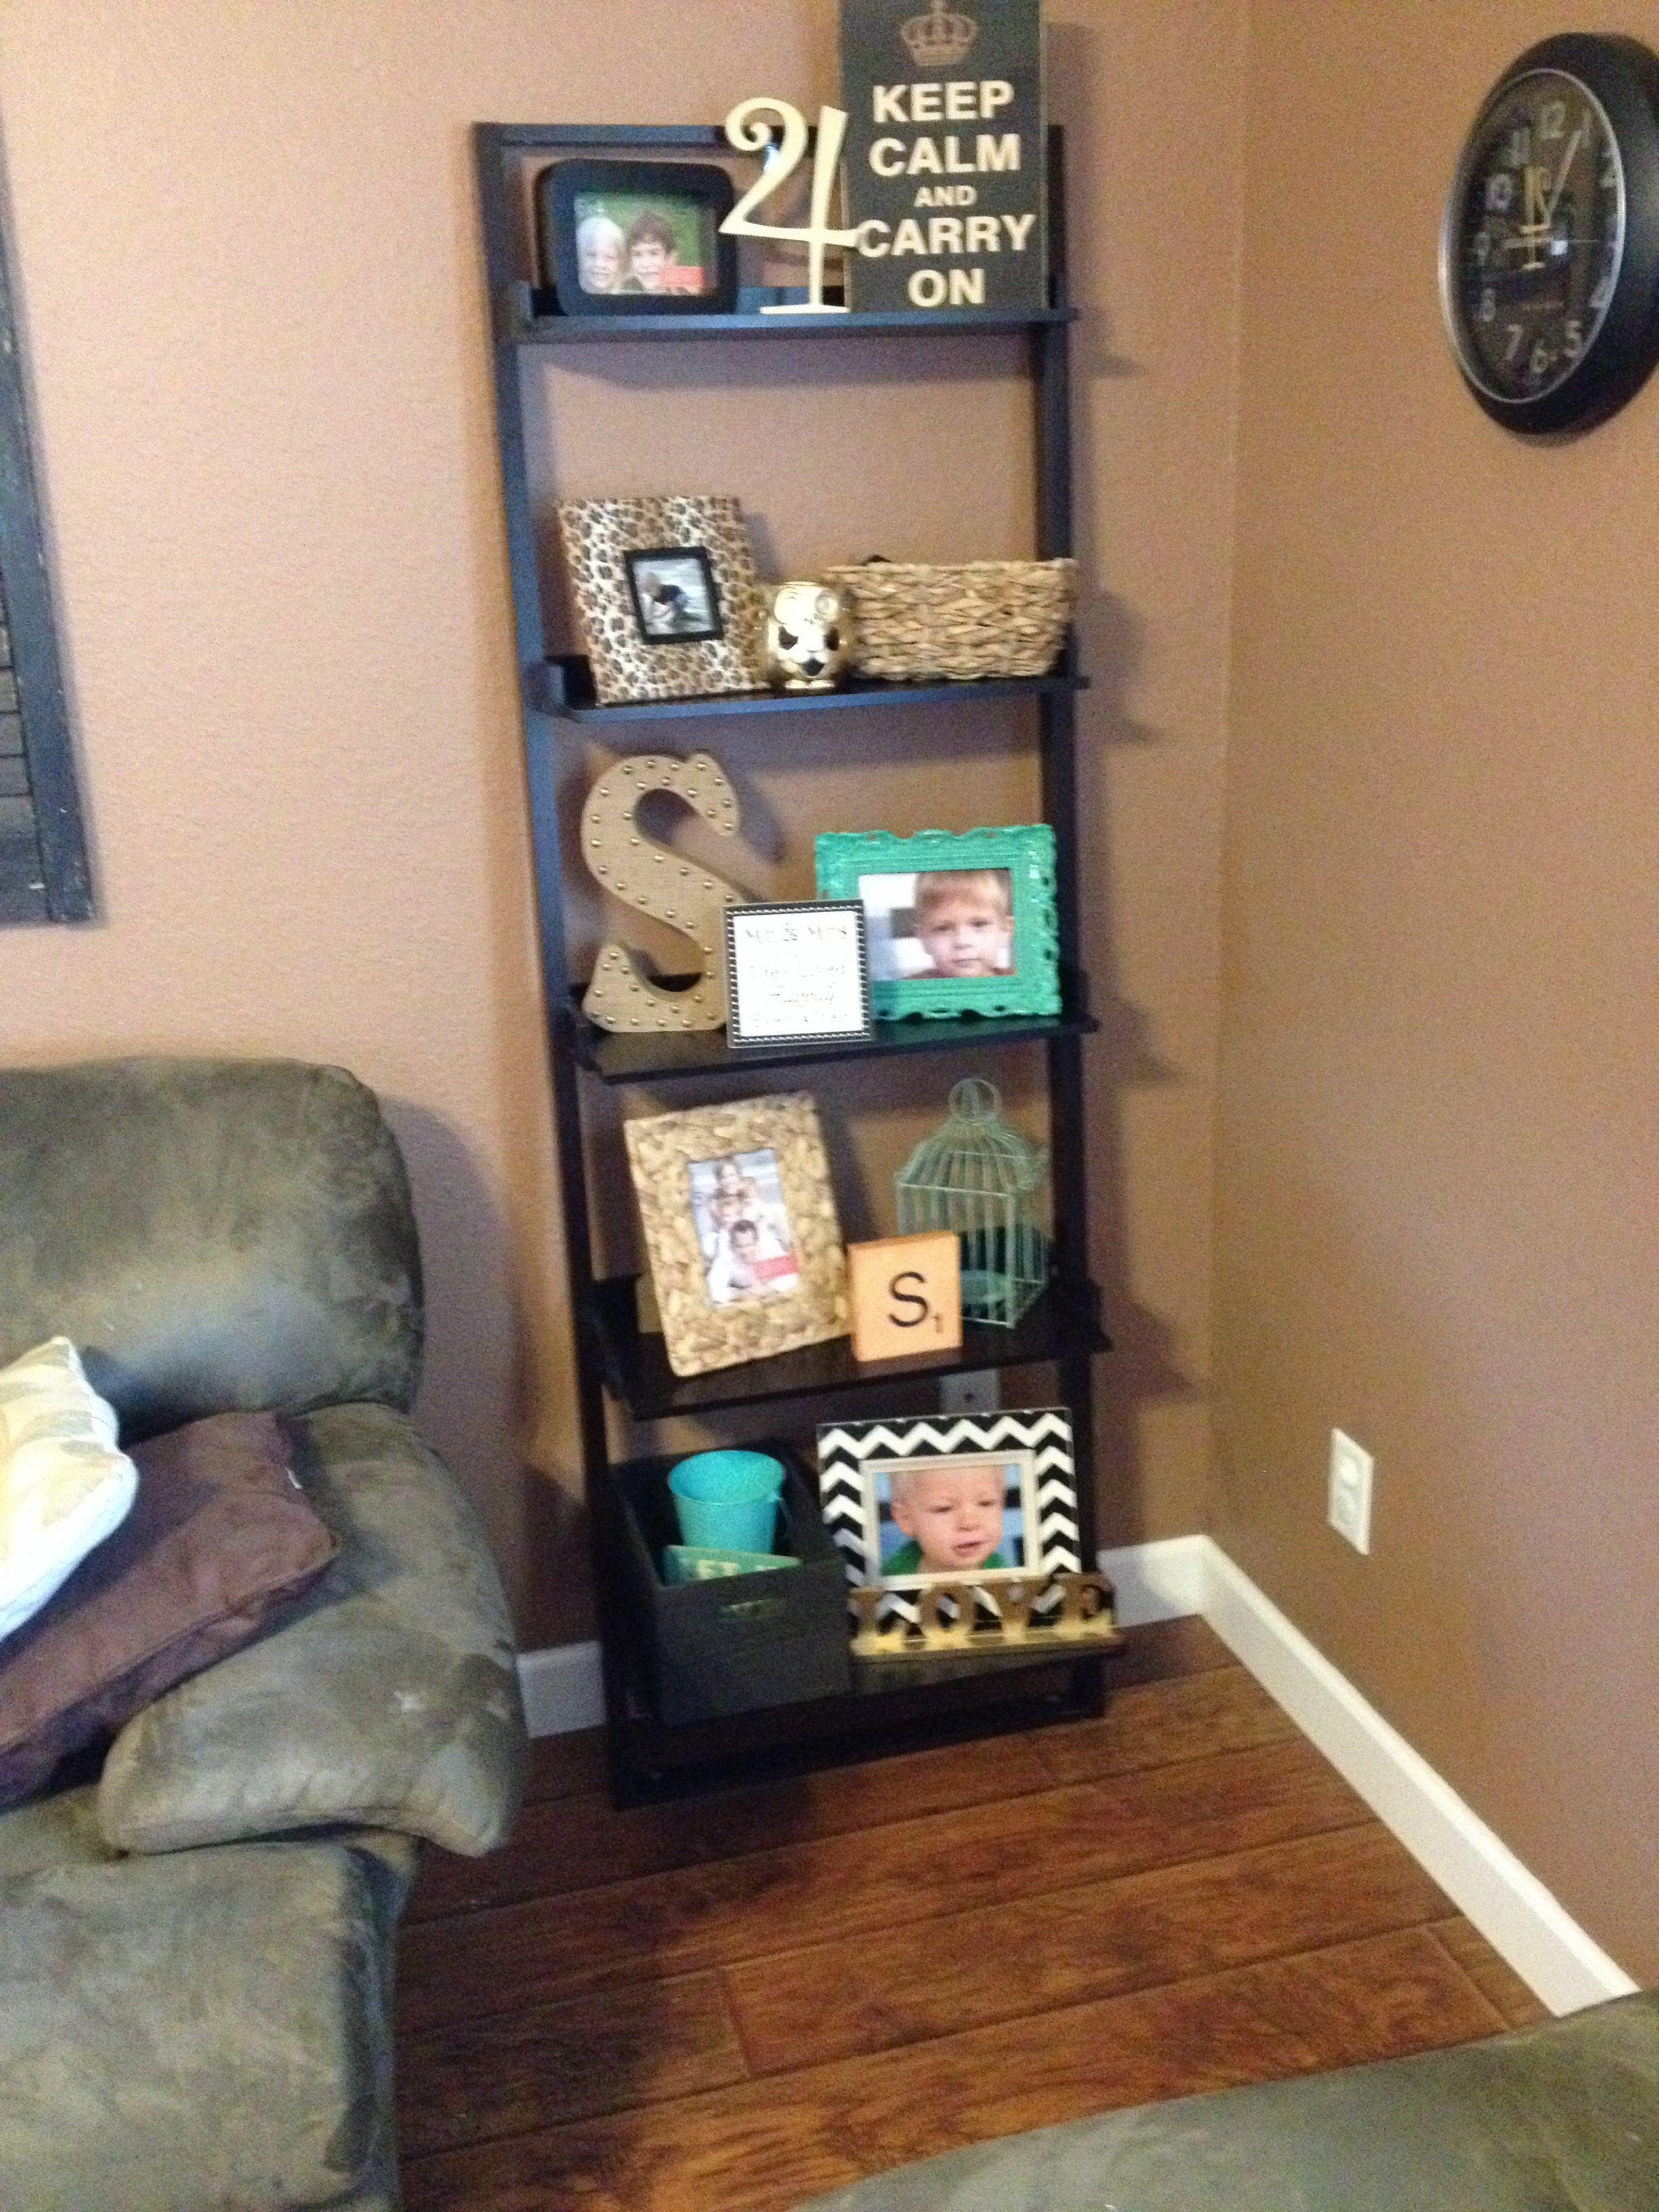 Pin By Samantha Murphy On Home Decor Ladder Shelf Decor Diy Shelf Decor Home Decor